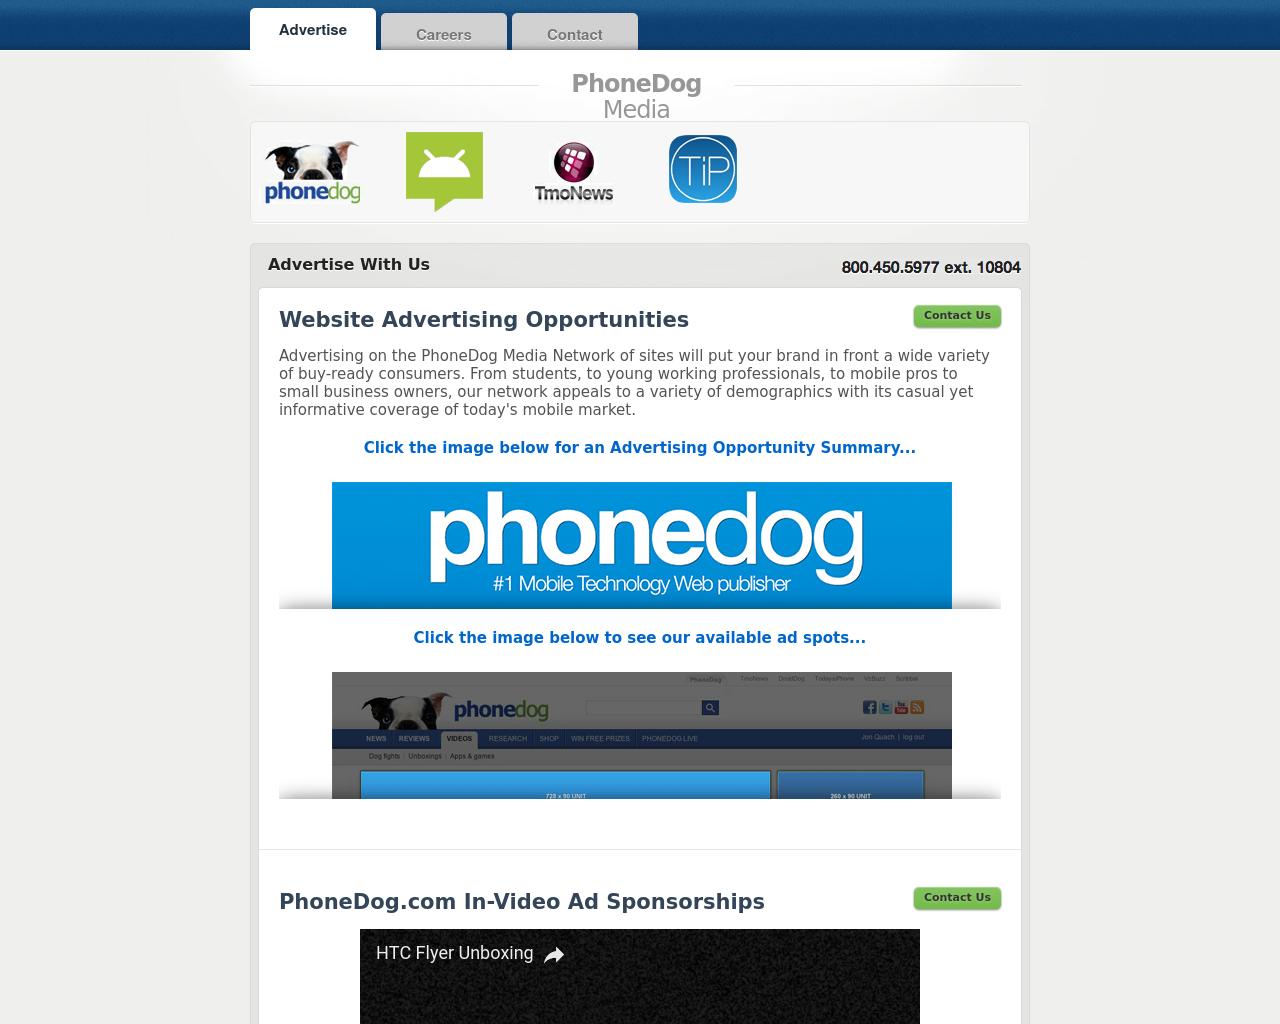 PhoneDog-Media-Advertising-Reviews-Pricing